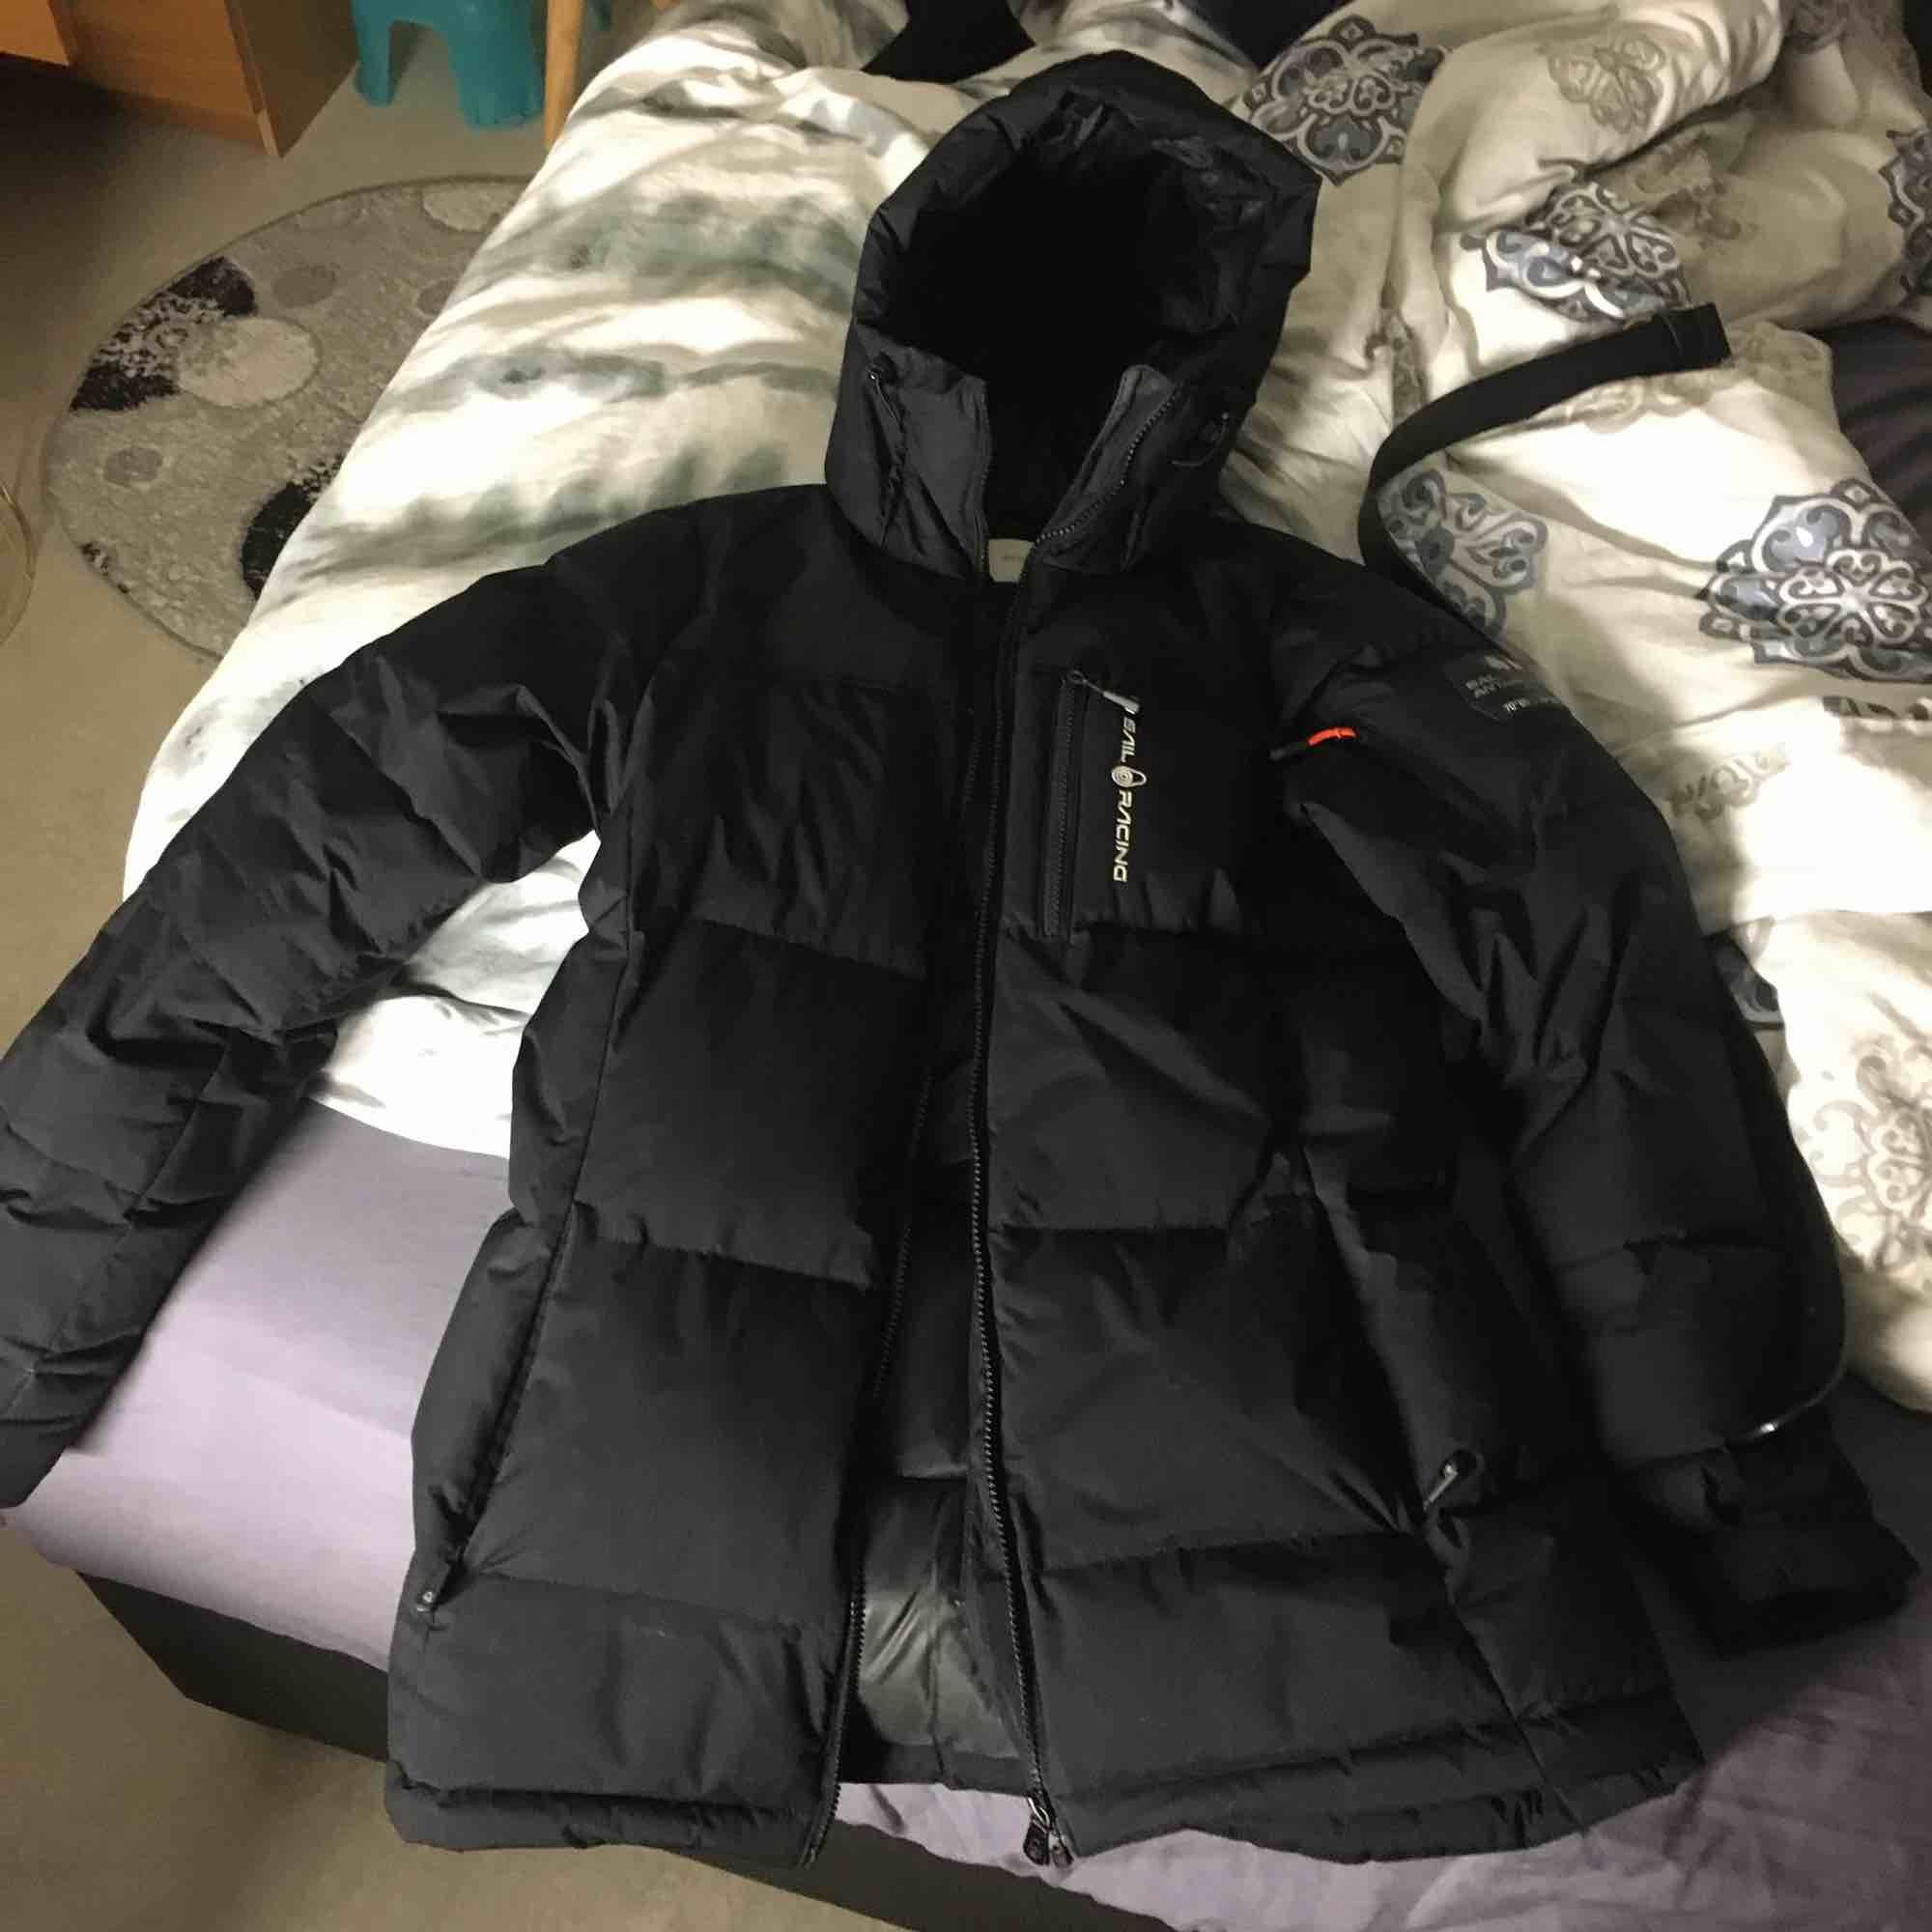 Bra skick på jackan använd en vinter, storlek s/m sitter lika bra på en s som på en m . Jackor.